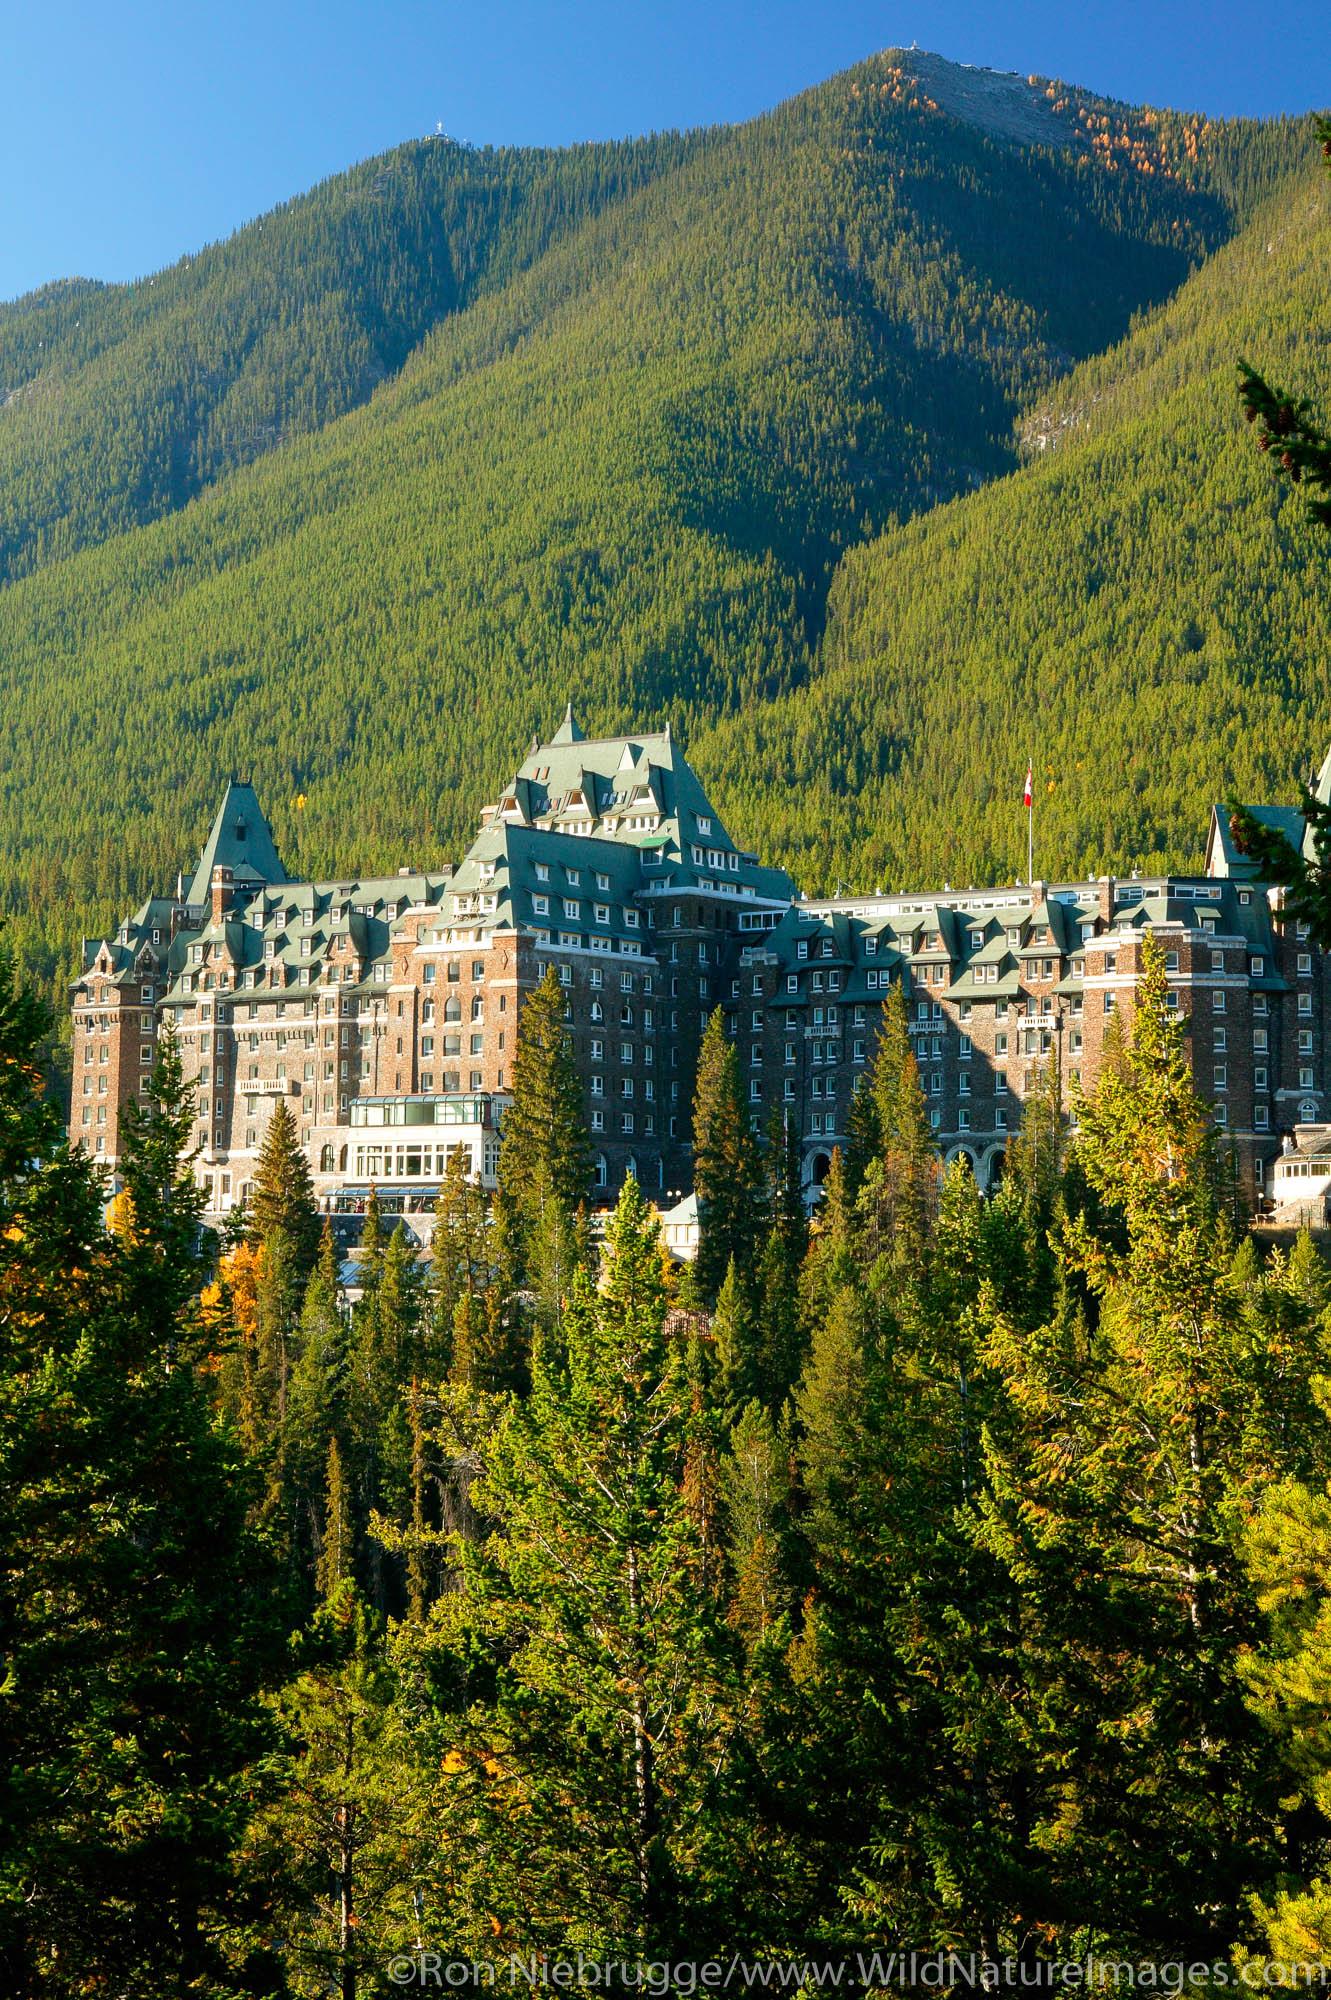 Banff Springs Hotel, Banff, Banff National Park, Alberta, Canada.